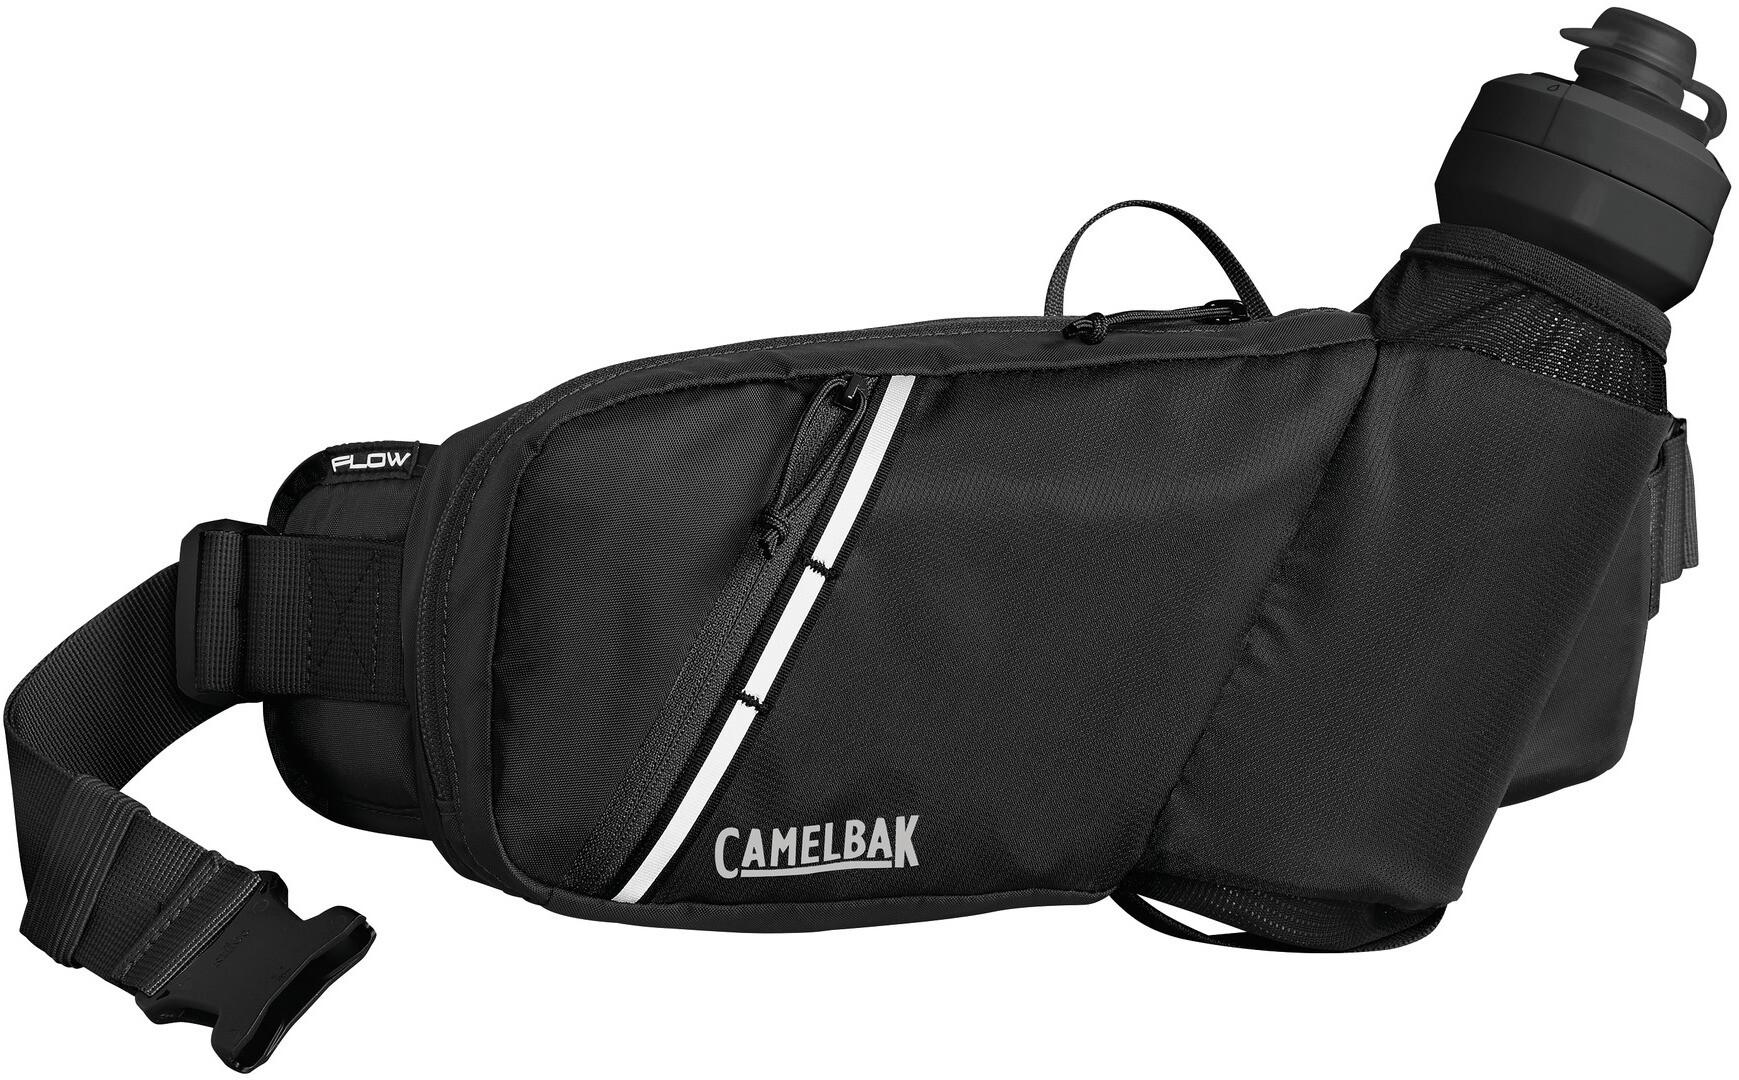 CamelBak Podium Flow Drikkebælte 620ml, black | Waist bags